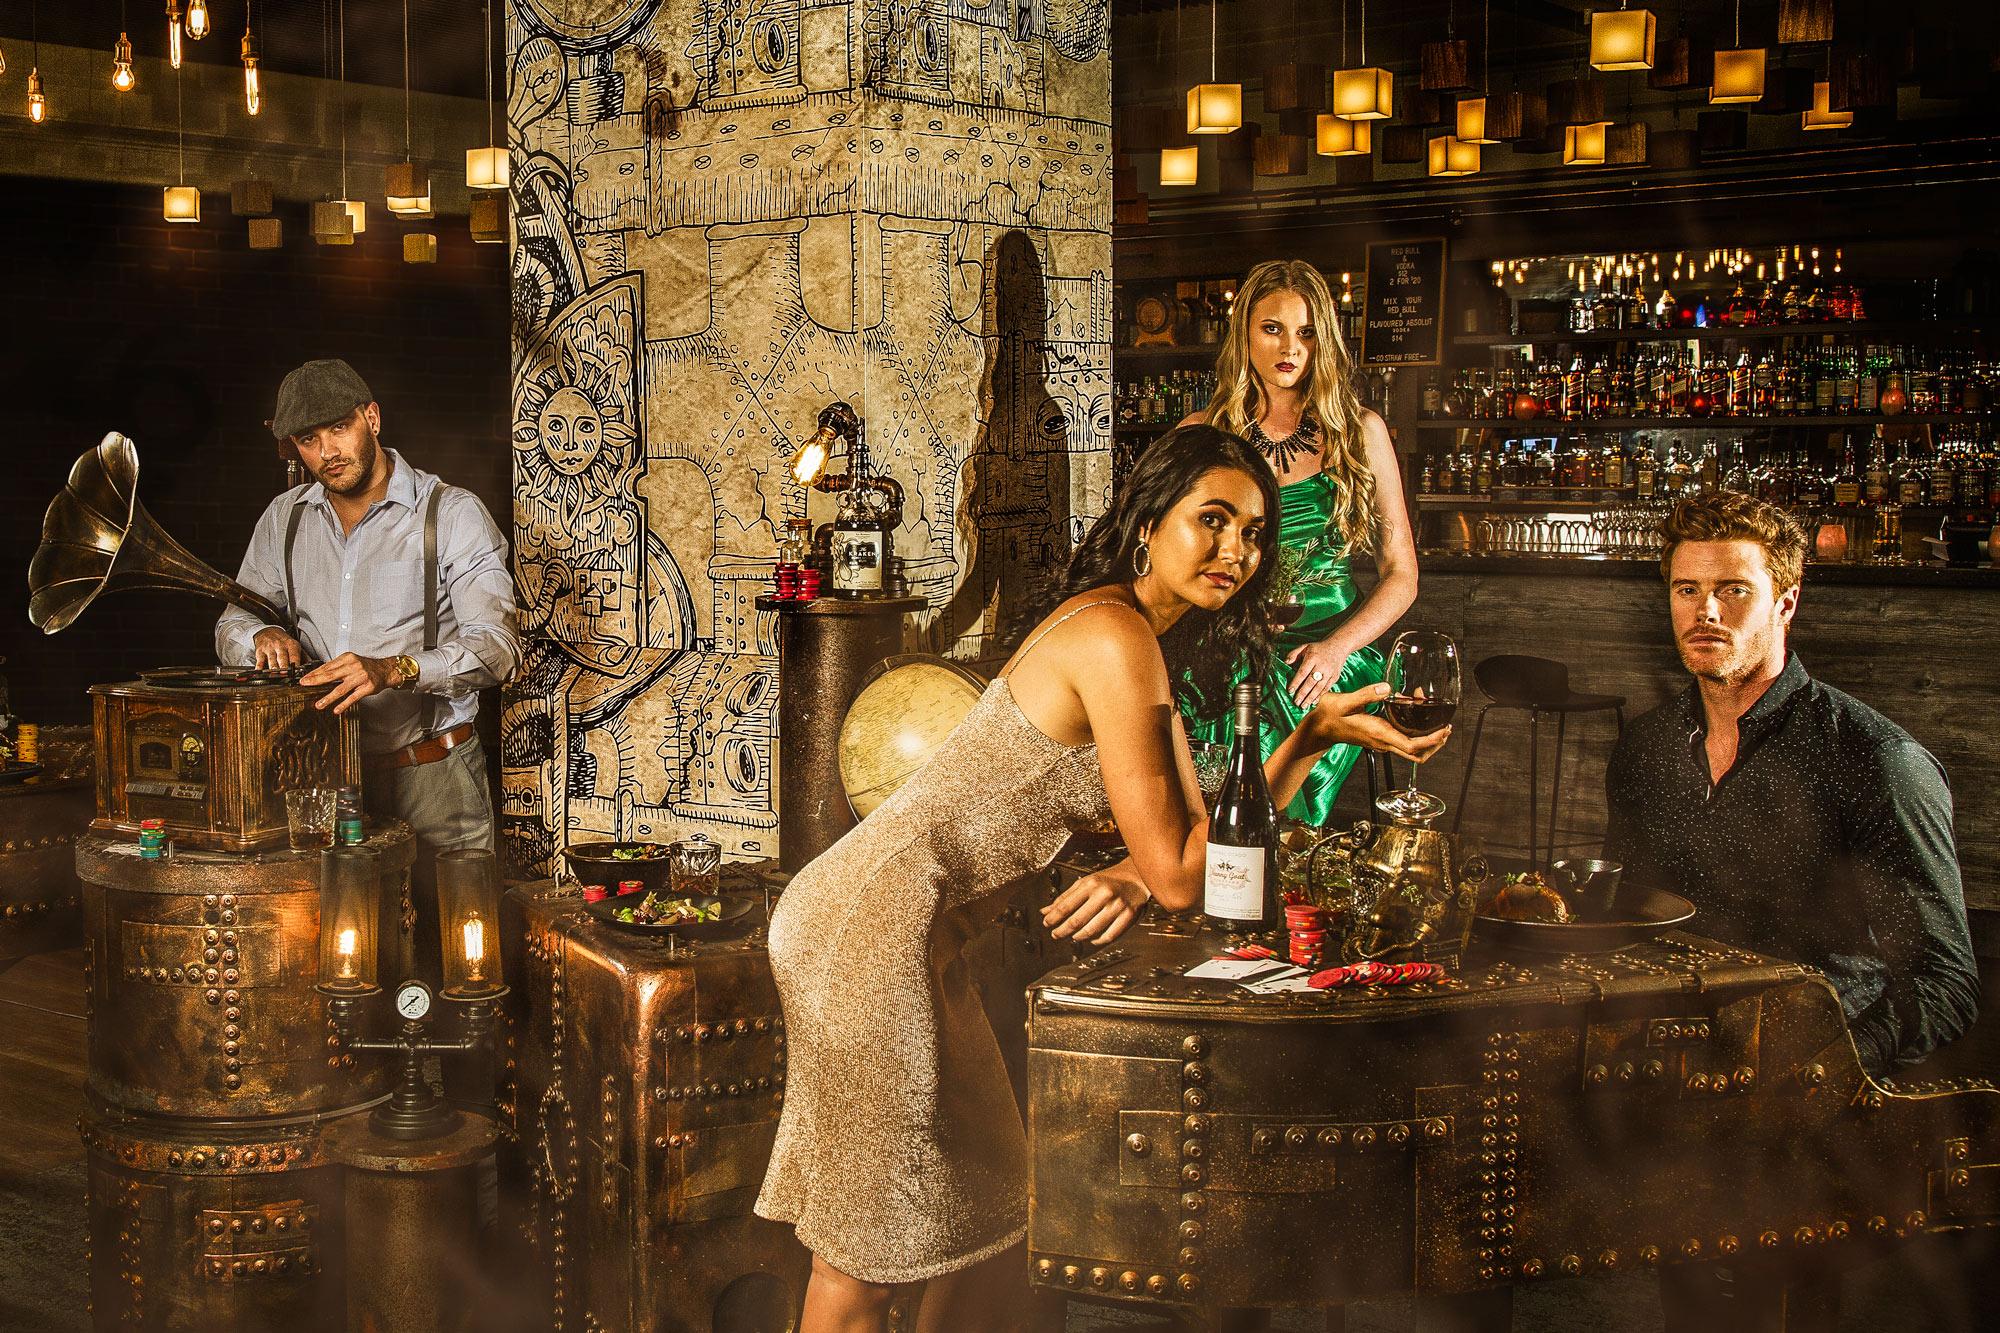 Commercial Lifestyle Photography Hotel Bar Steampunk by Adrian Kilchherr Switzerland Europe Australia